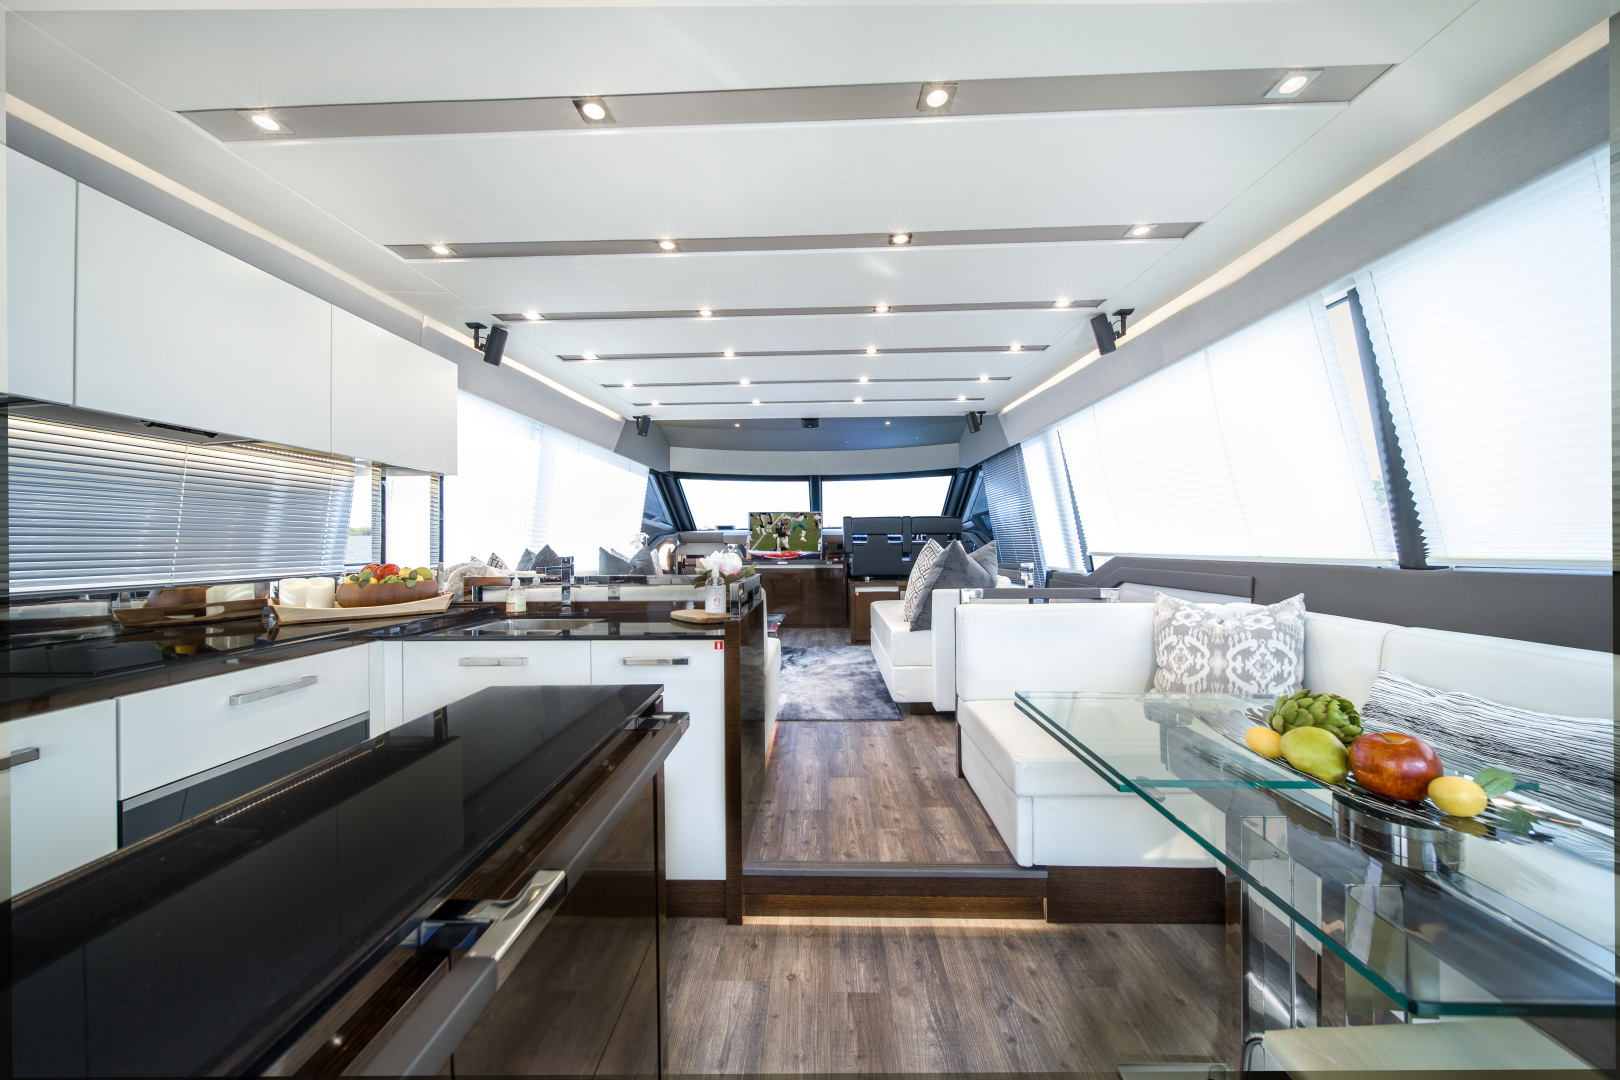 Prestige-680 Flybridge 2018-Seduction Sarasota-Florida-United States-2018 68 Prestige 680 Flybridge  Salon-1501854 | Thumbnail